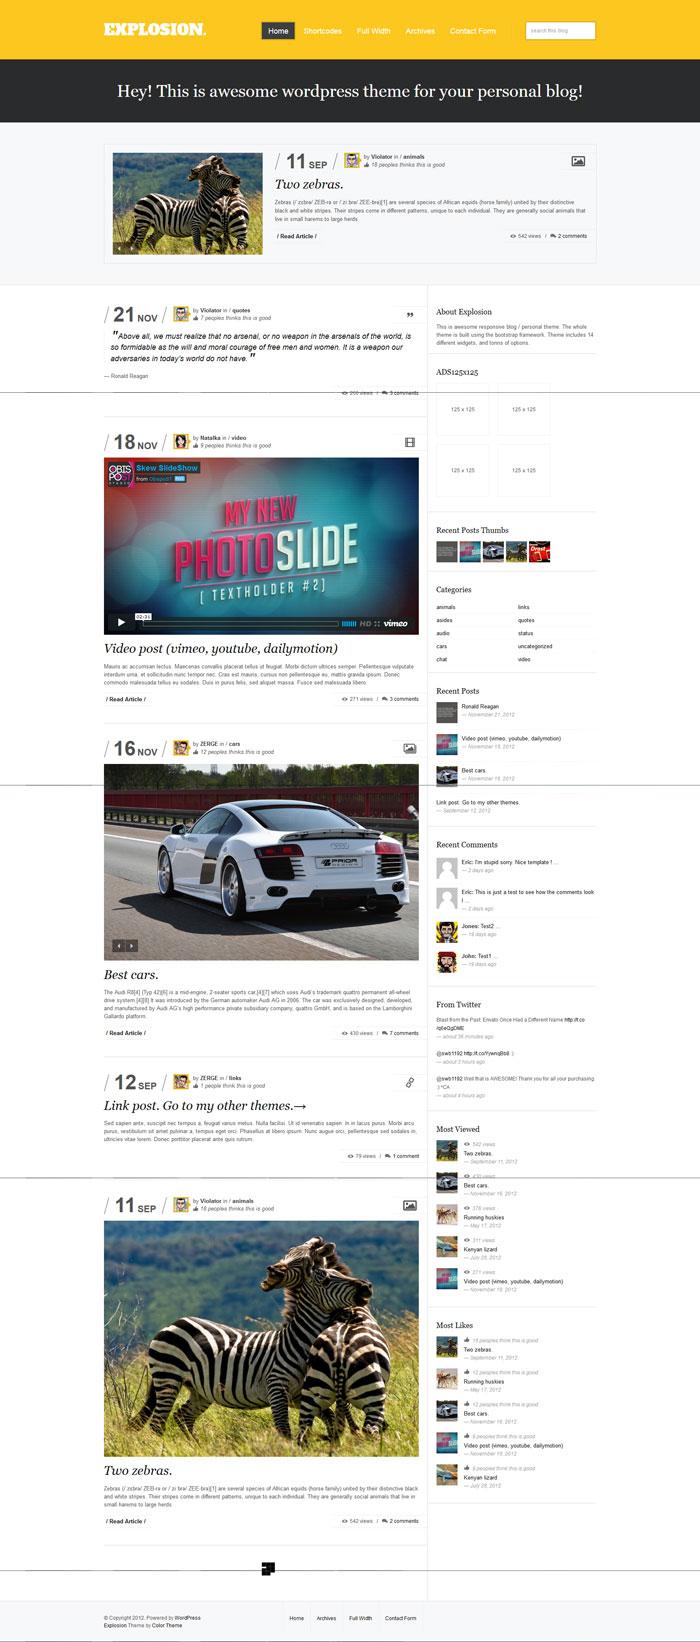 Explosion - Responsive WordPress Blog / Personal